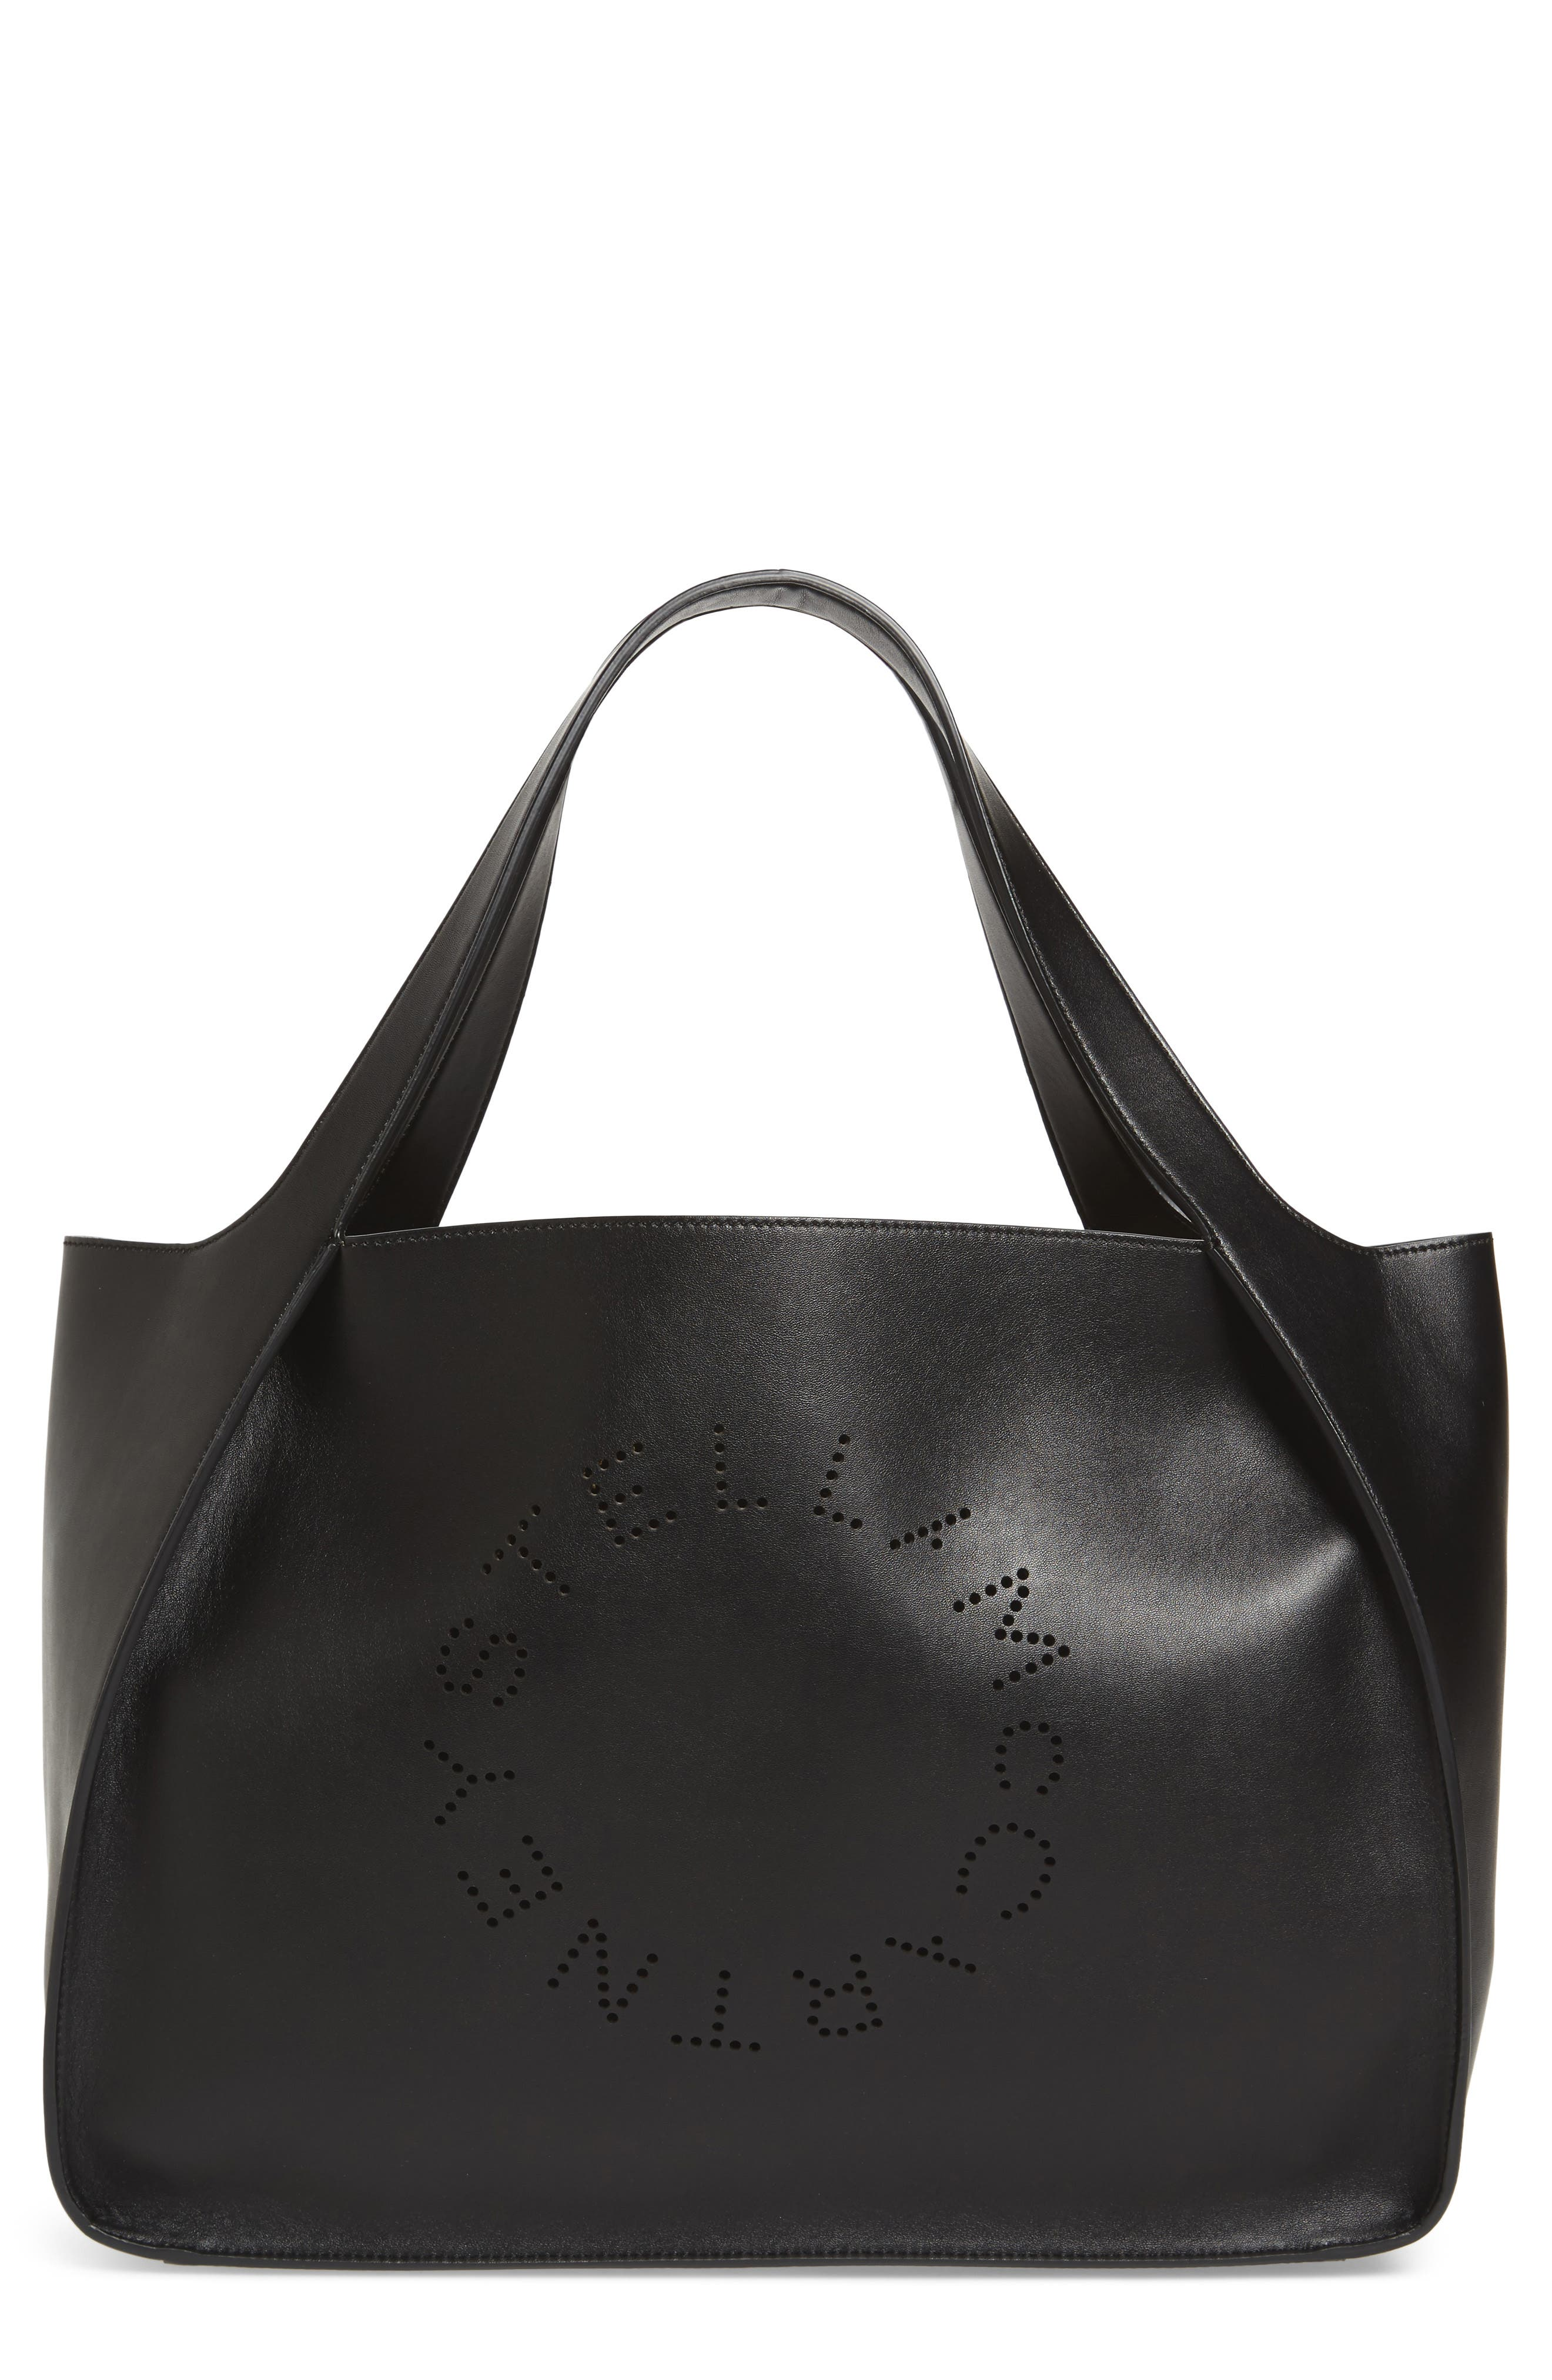 STELLA MCCARTNEY, Medium Perforated Logo Faux Leather Tote, Main thumbnail 1, color, BLACK